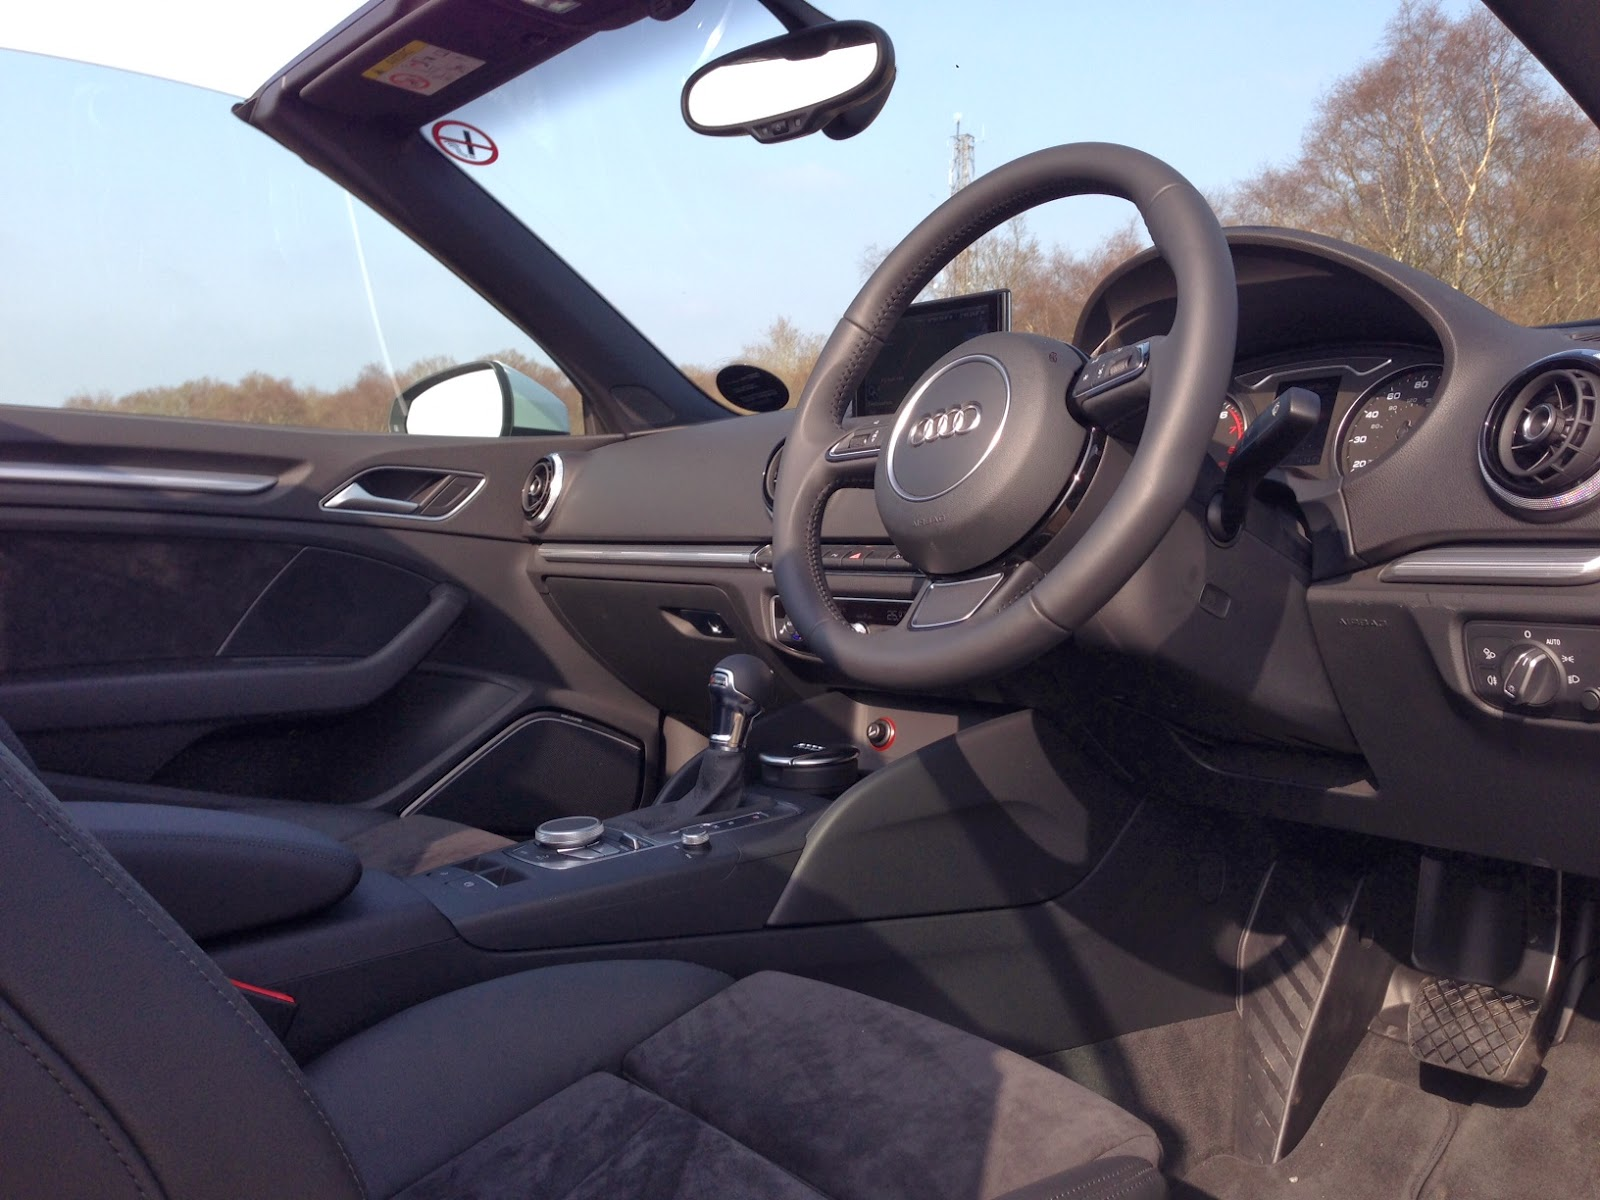 2014 Audi A3 Cabriolet interior